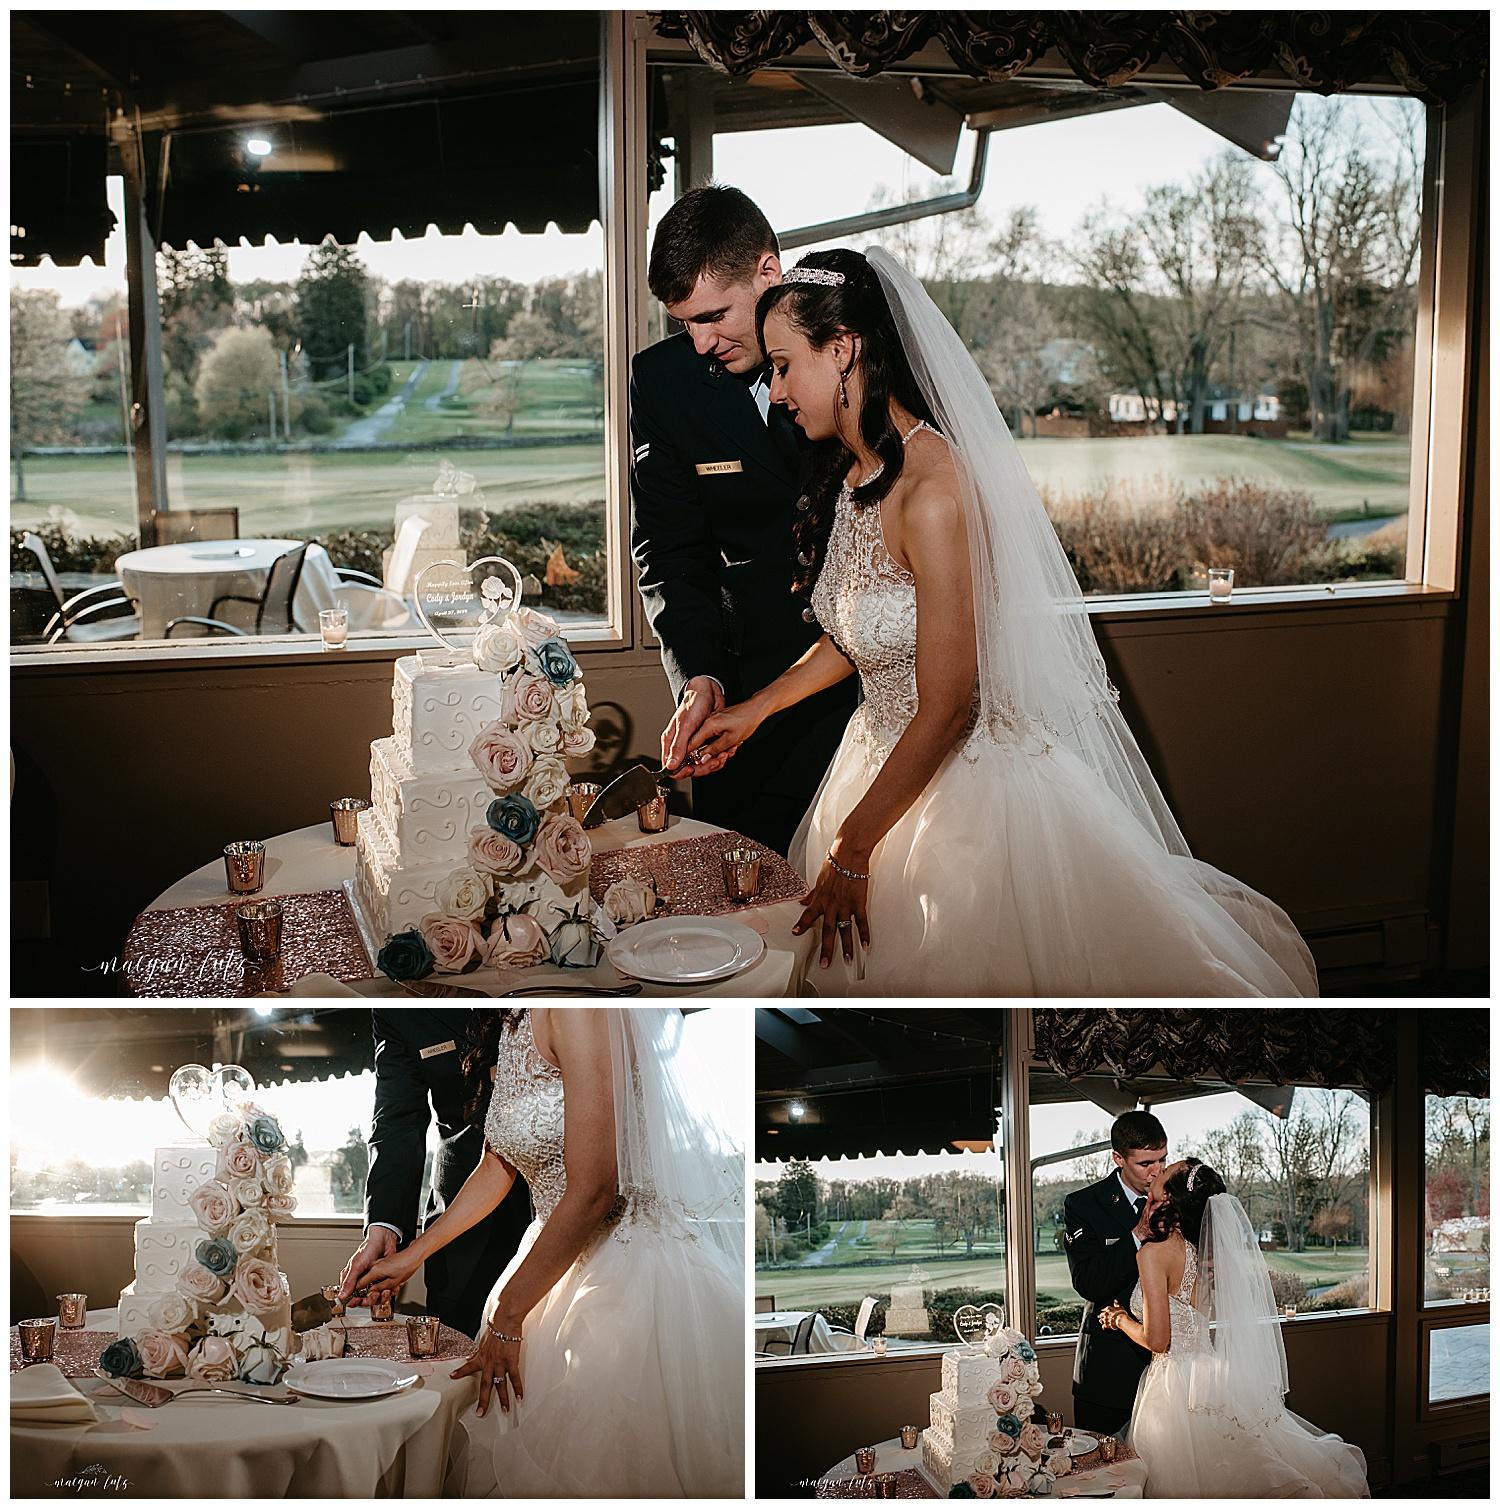 NEPA-Lehigh-Valley-Wedding-Photographer-at-Glen-Oak-Country-Club-Clarks-Summit-PA_0058.jpg